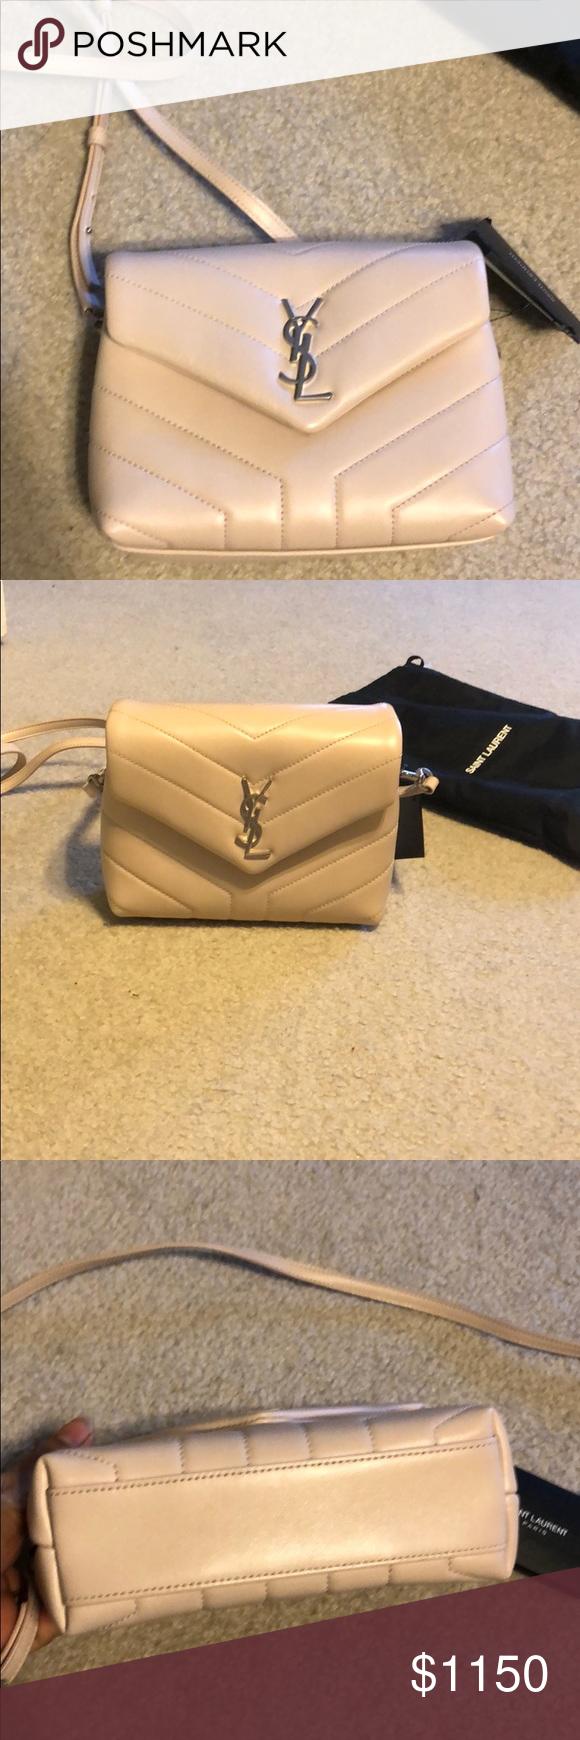 b8ba9bed YSL Saint Laurent Toy Lou Lou Light Pink bag Gorgeous ***brand new ...